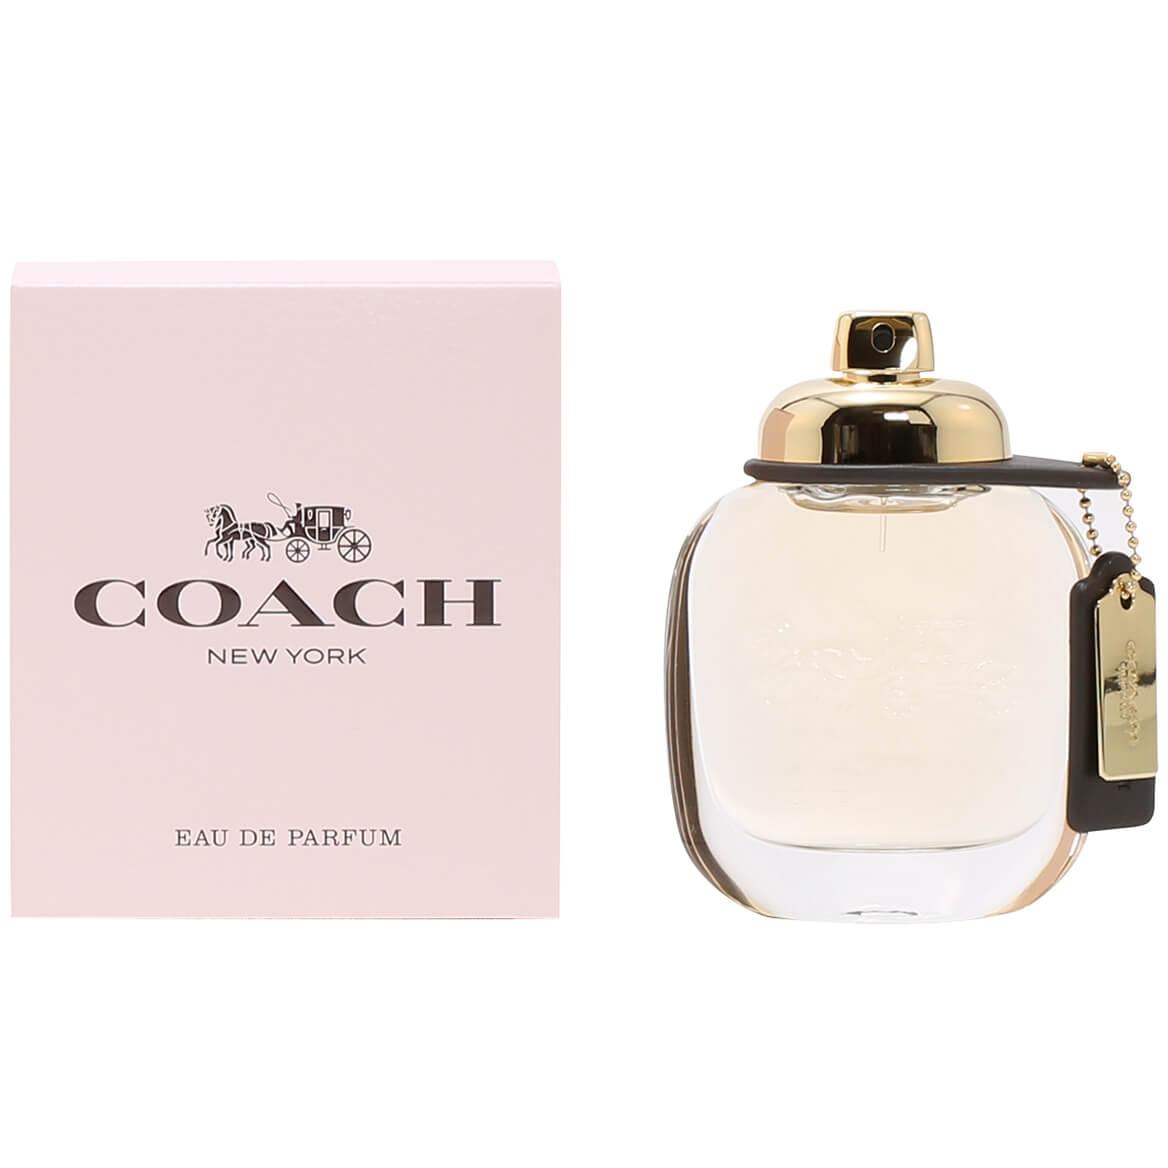 Coach New York for Women EDP, 1.7 oz.-366827